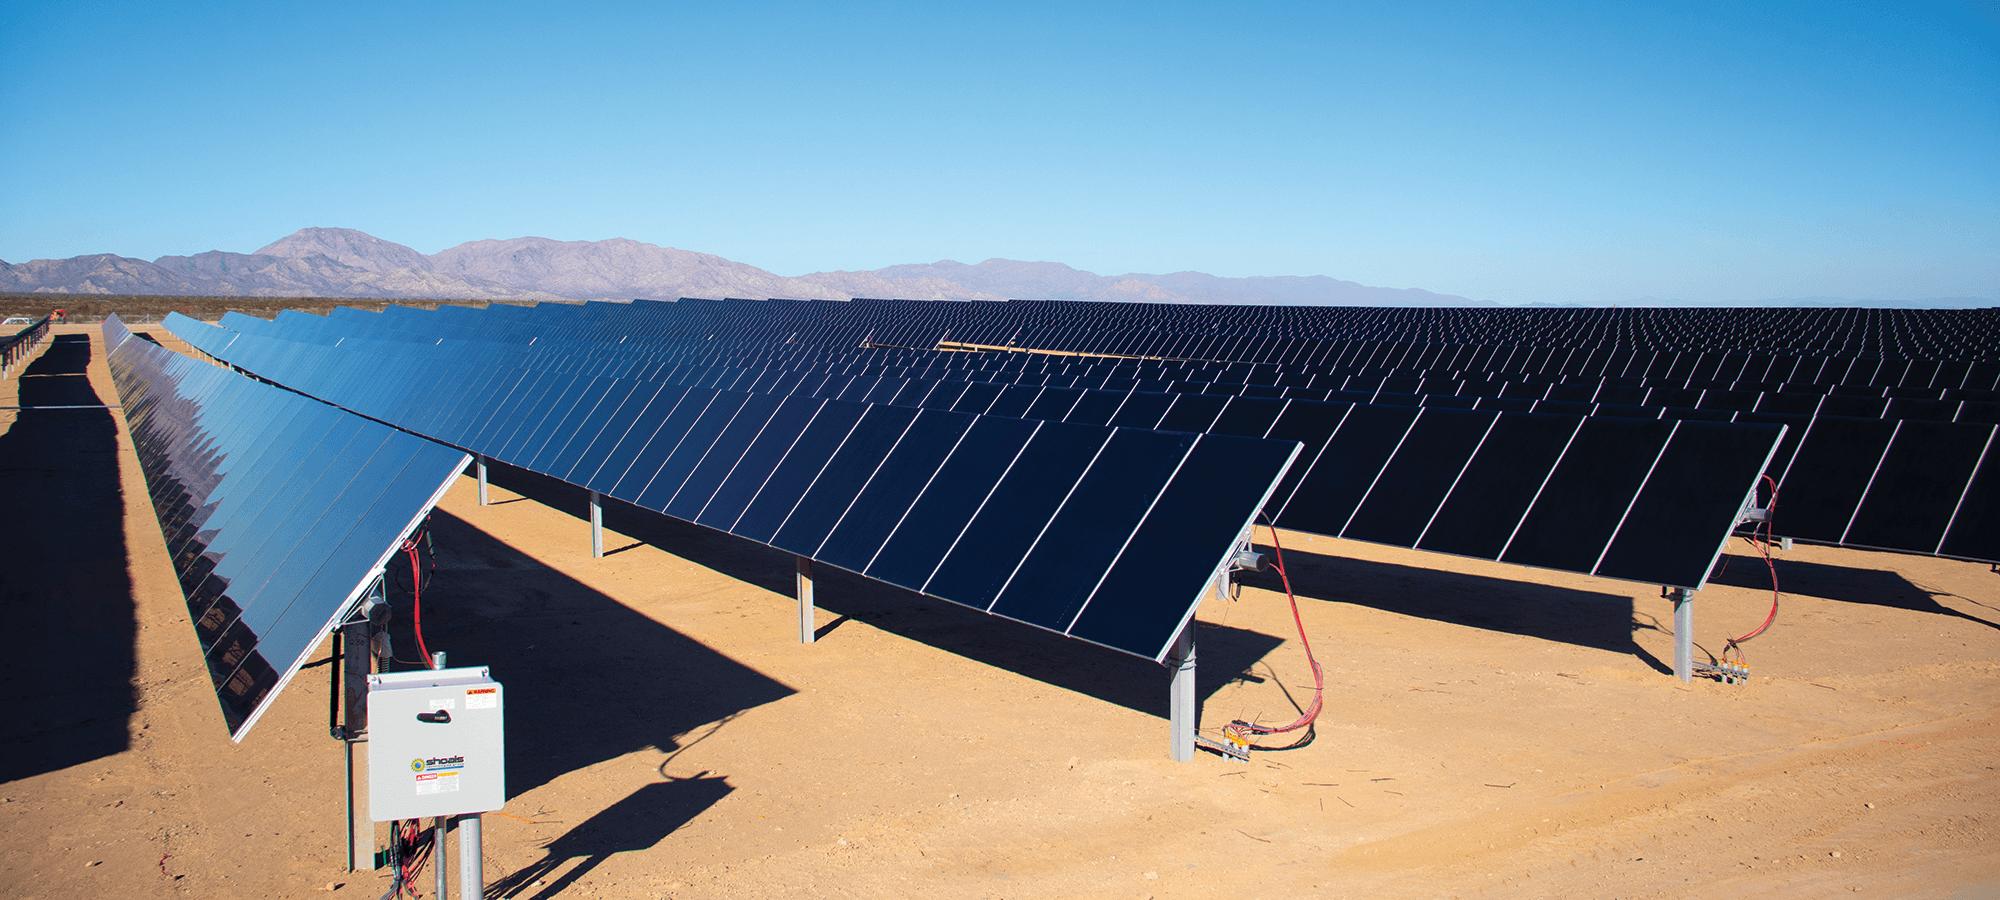 Arizona Solar 1 Salome Solar image